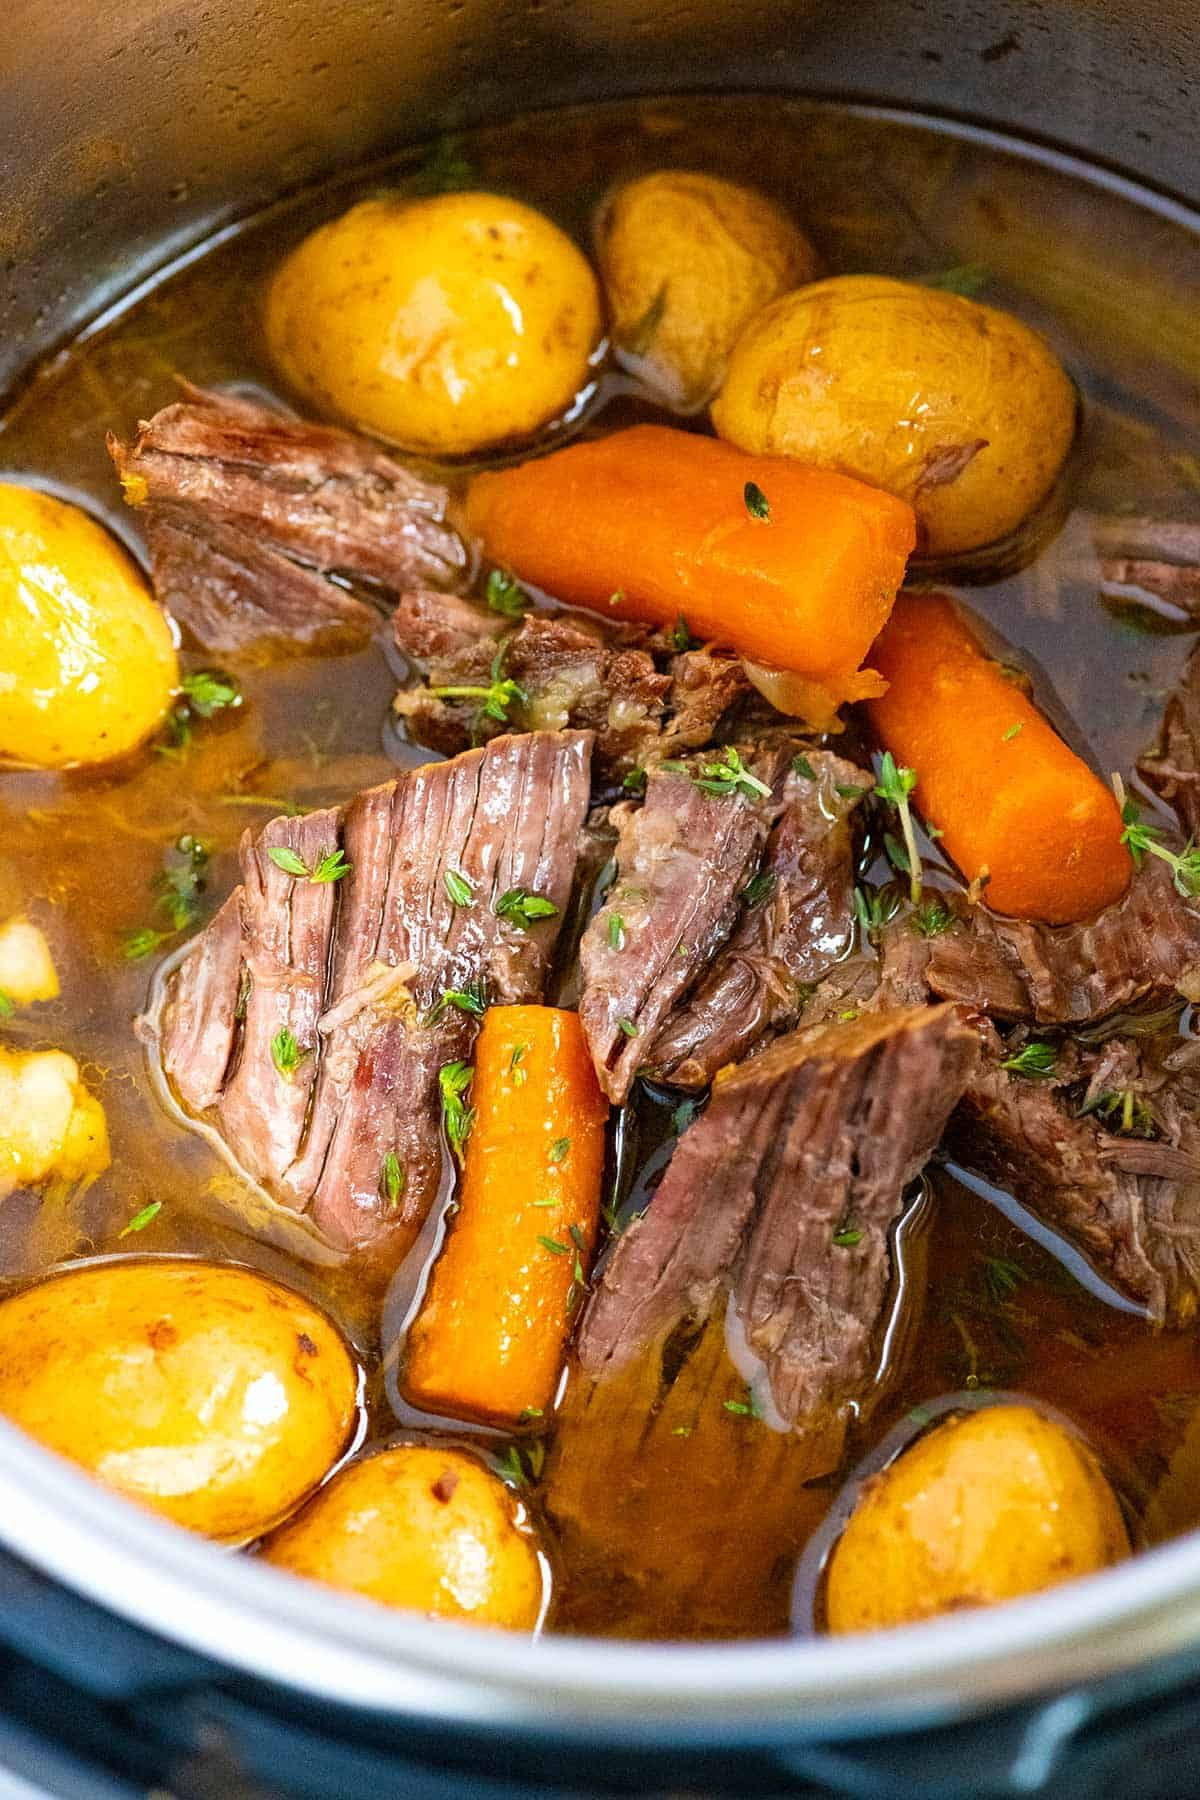 Easy Instant Pot Pot Roast Tender And Juicy Recipe Pot Roast Recipes Instant Pot Recipes Instant Pot Dinner Recipes